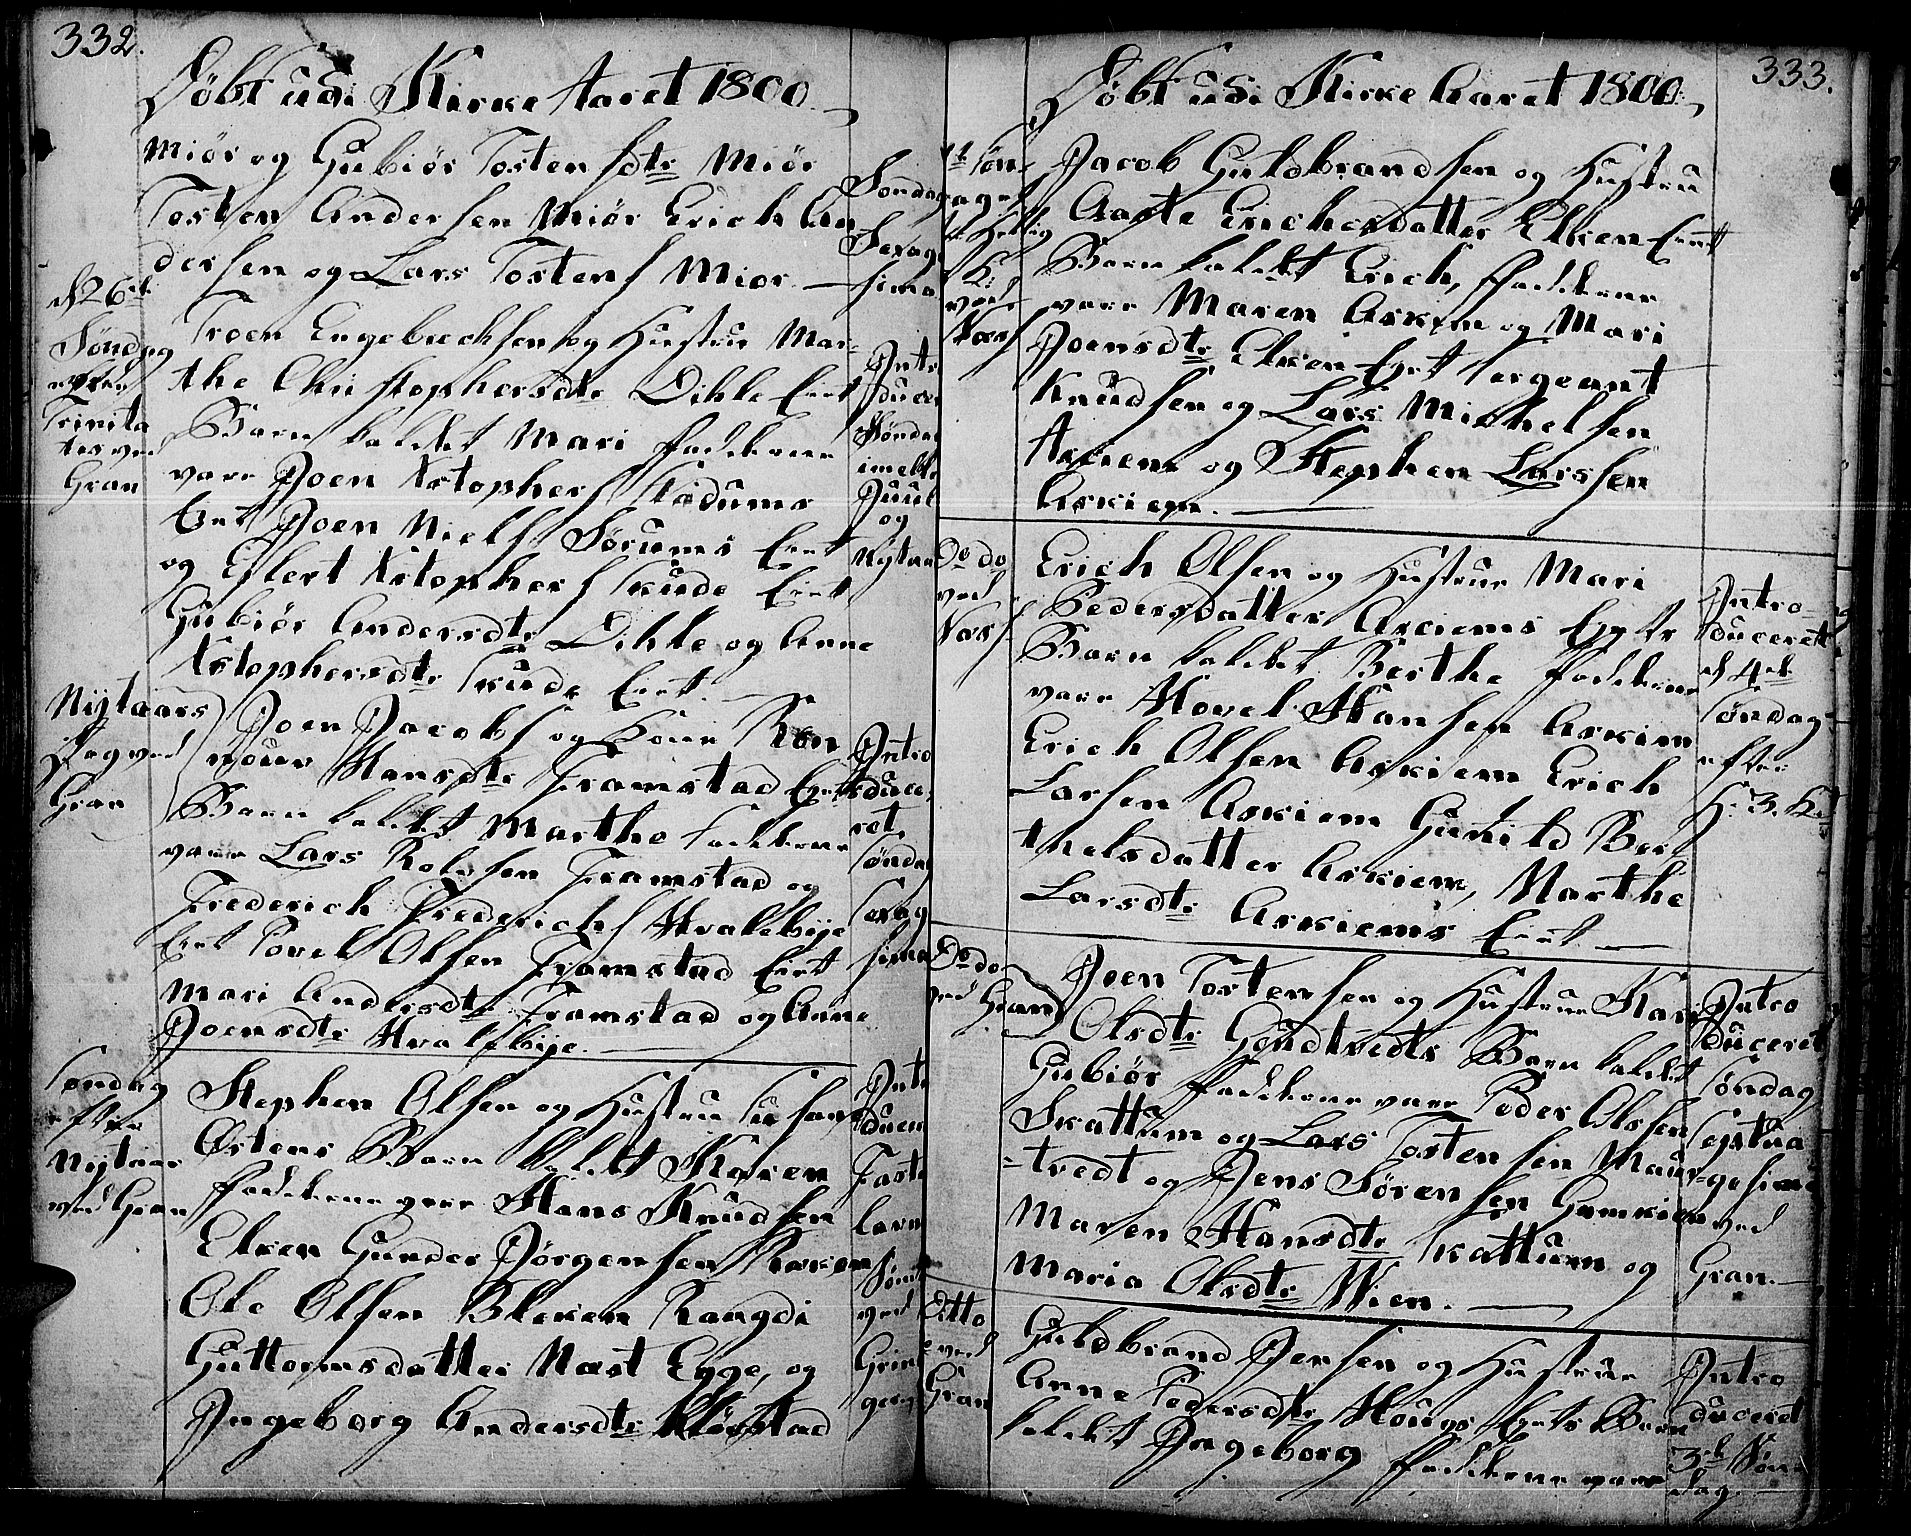 SAH, Gran prestekontor, Ministerialbok nr. 6, 1787-1824, s. 332-333